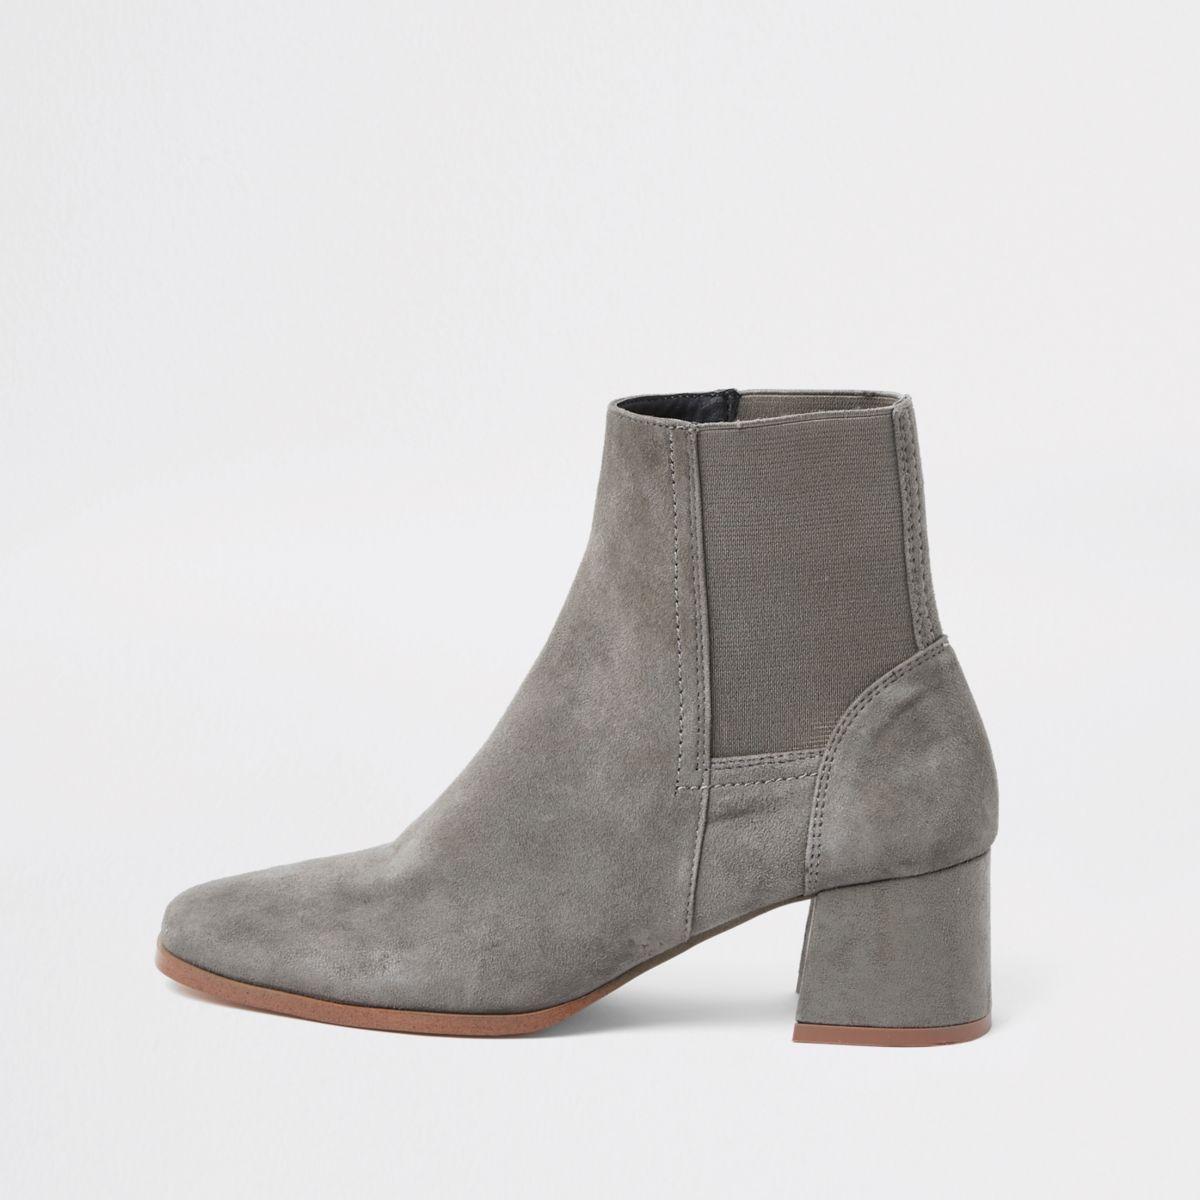 Grey suede square toe block heel boots